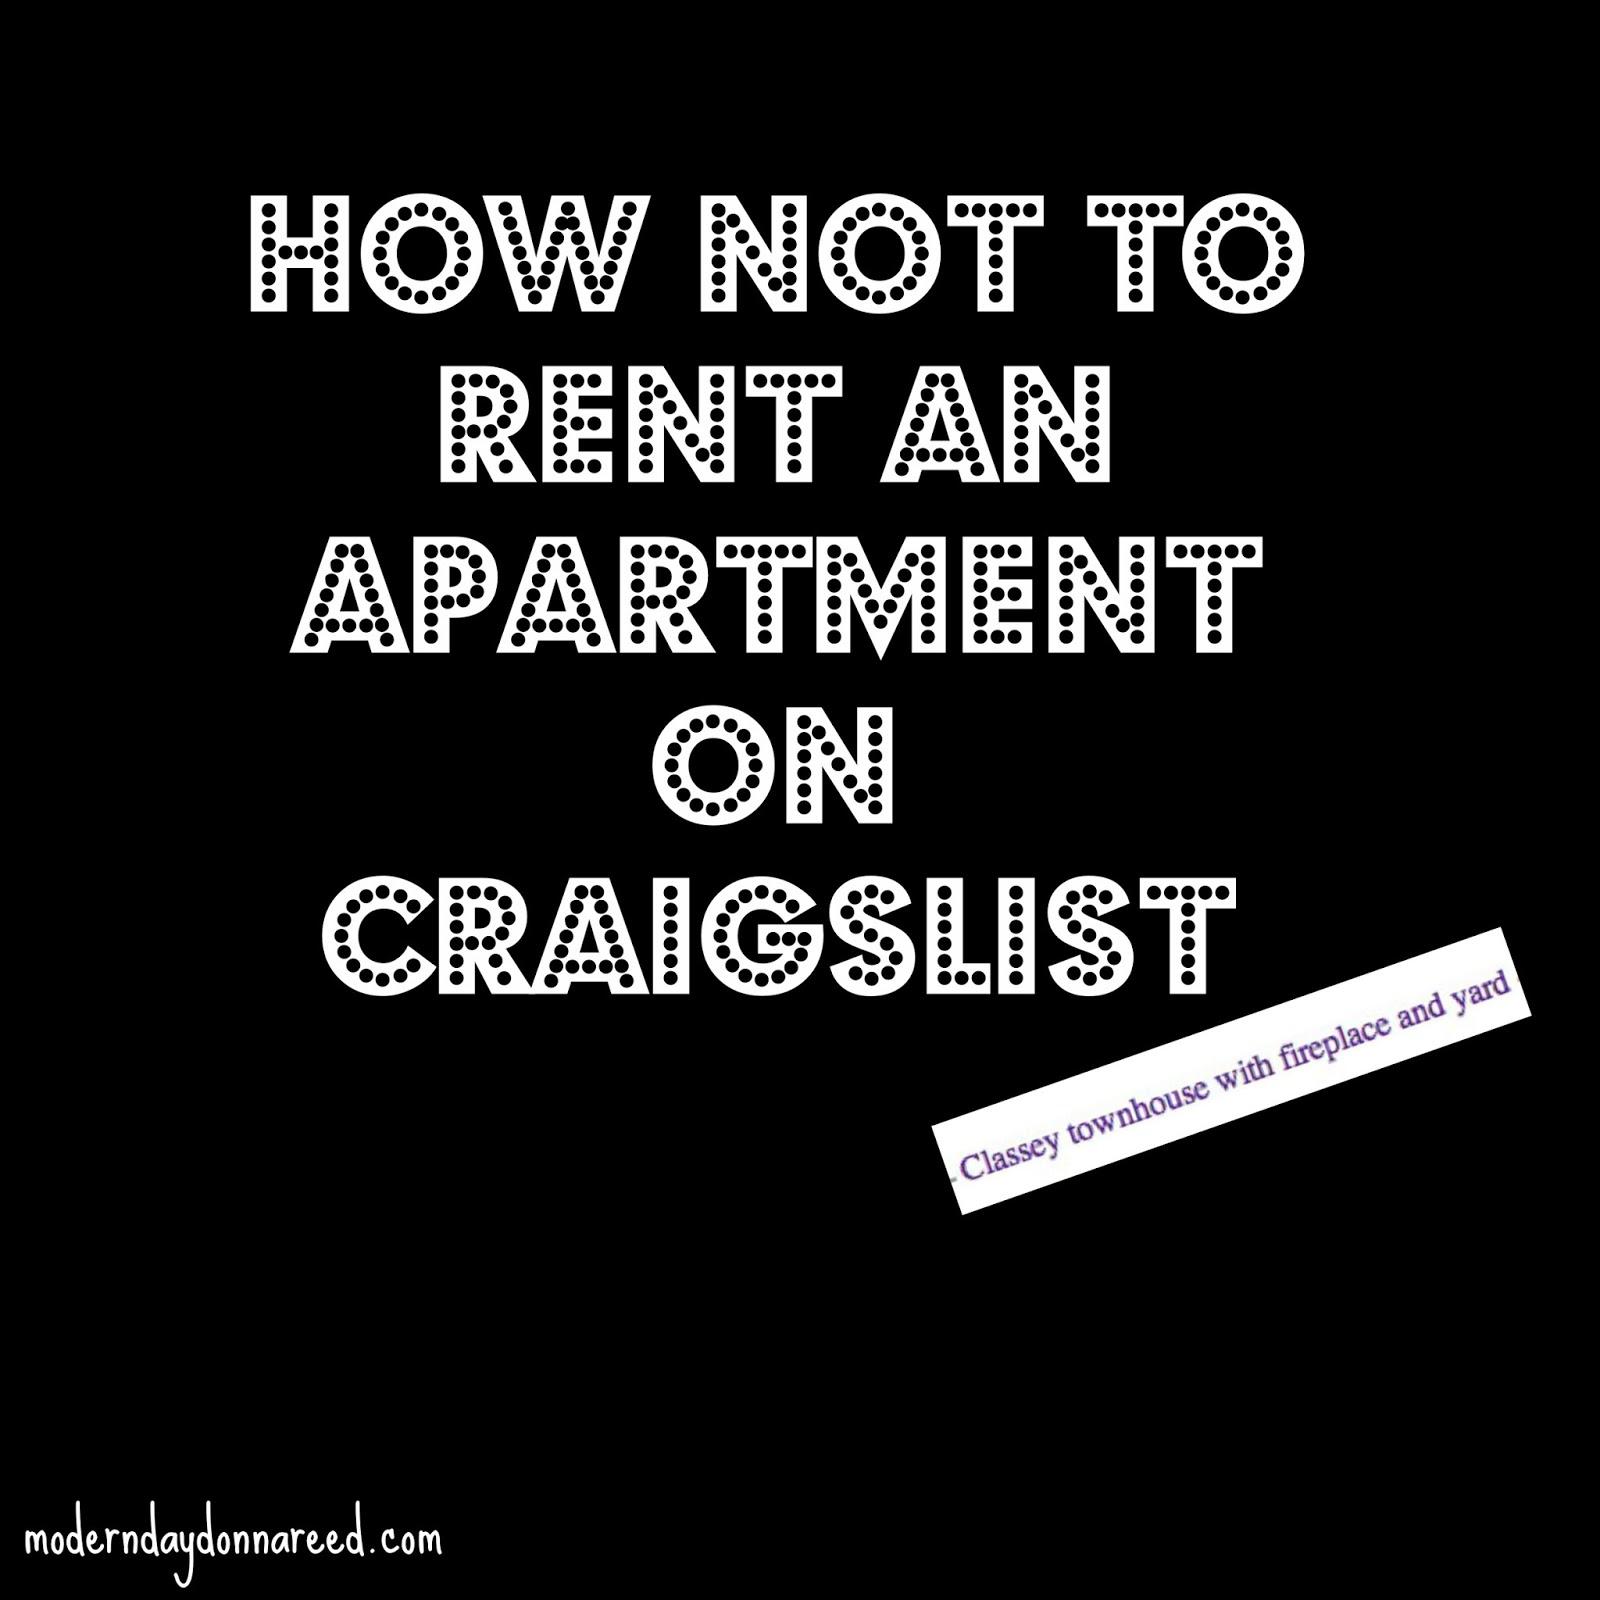 Craigslist Apartment Rentals: How Not To Rent An Apartment On Craigslist